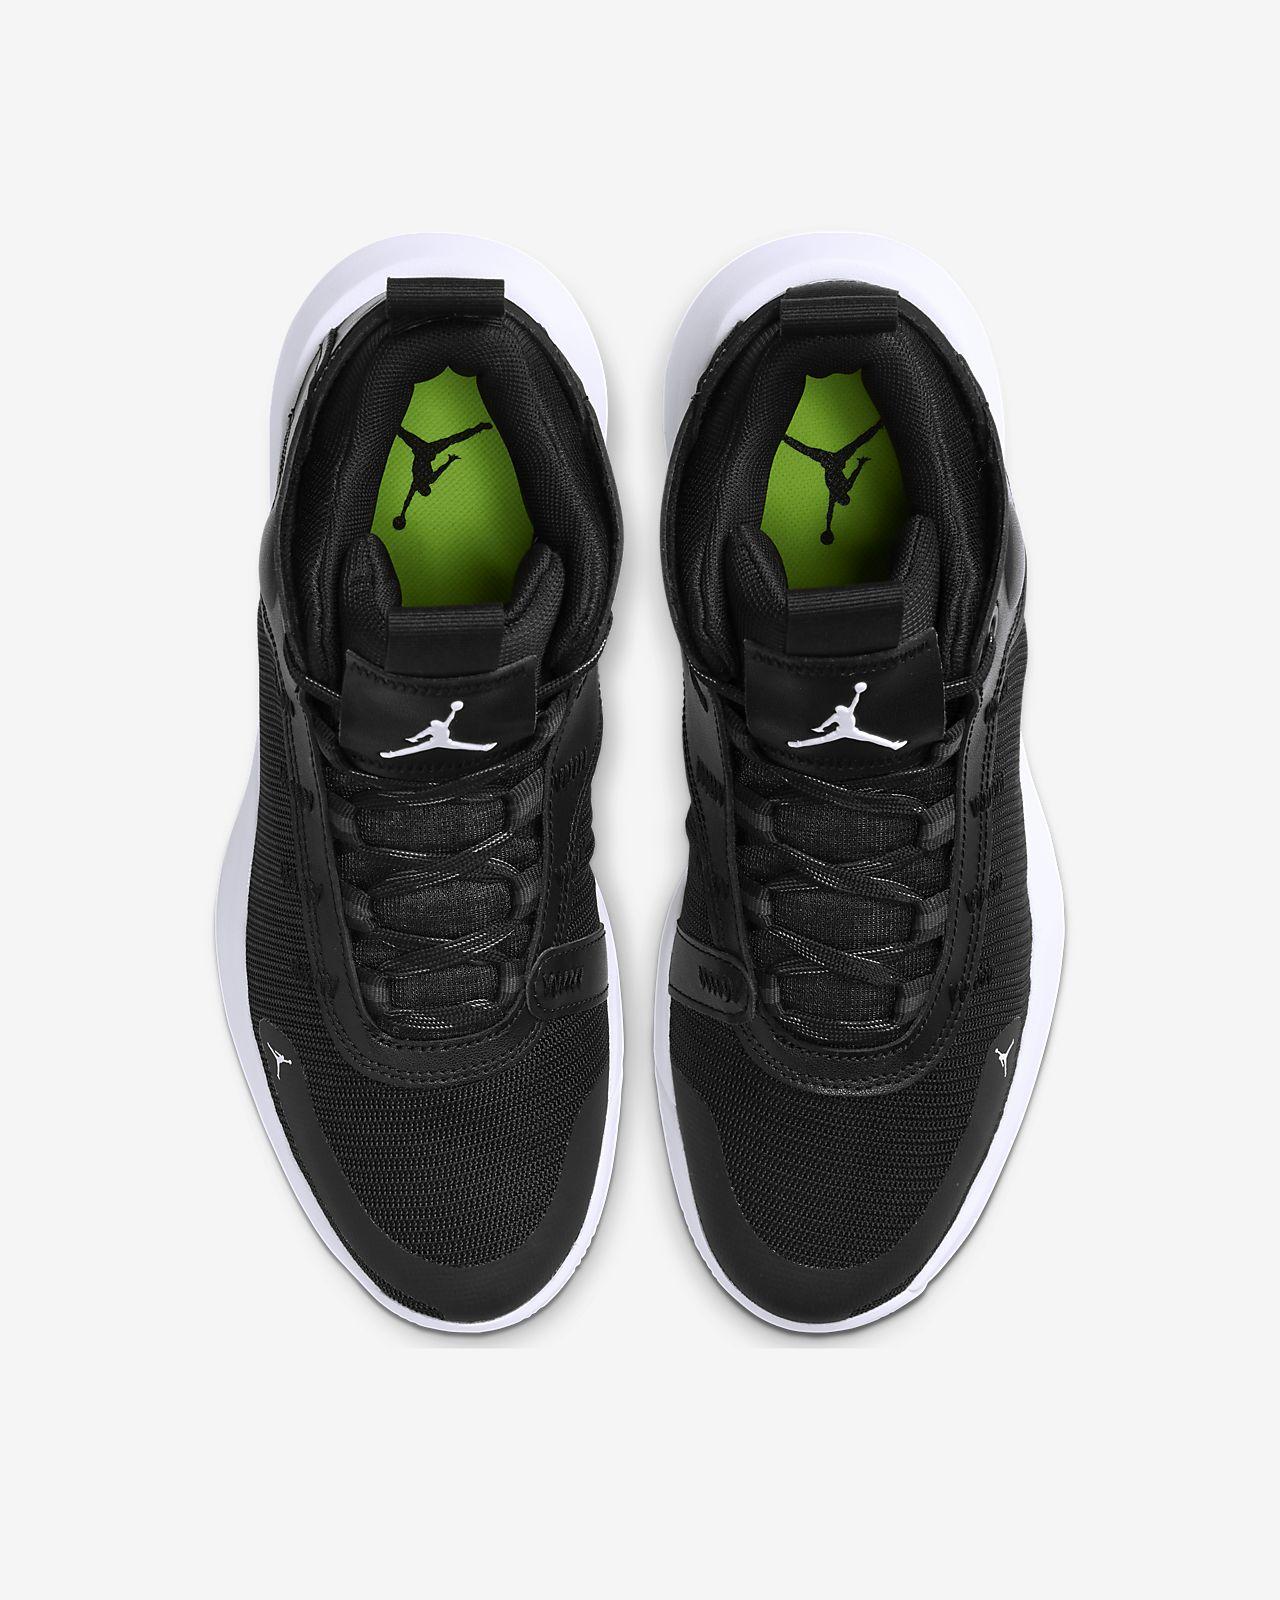 nike tennis shoes 2020